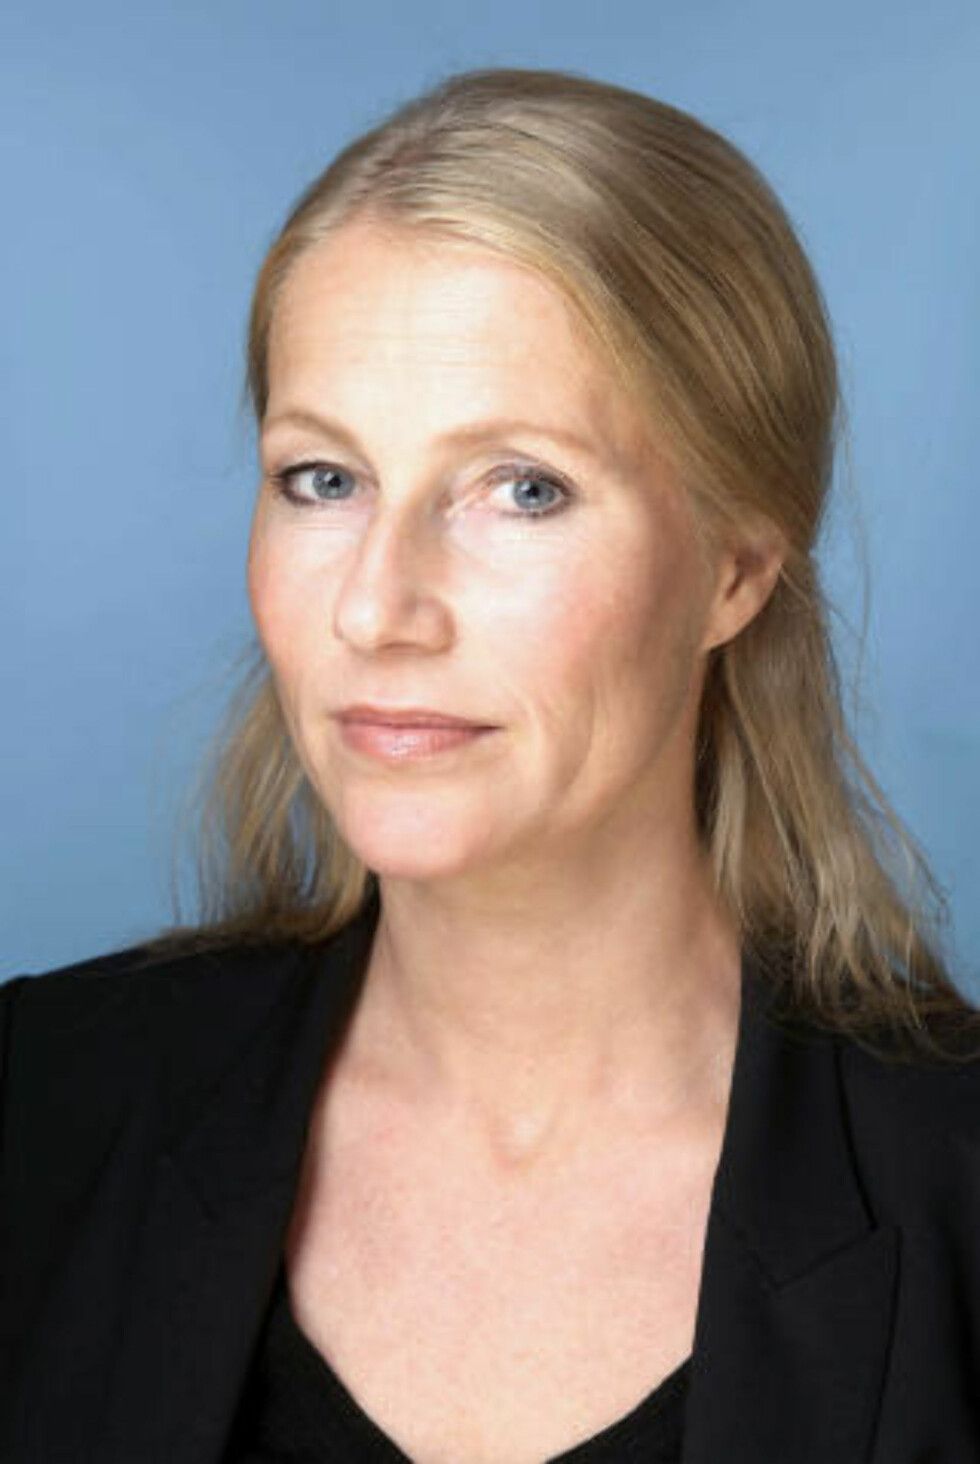 SKADELIG: Conform mener Møbelringens stol kan skade salget, forteller advokat Camilla Vislie i Thommessen. (Foto: CF-WESENBERG / KOLONIHAVEN.NO)